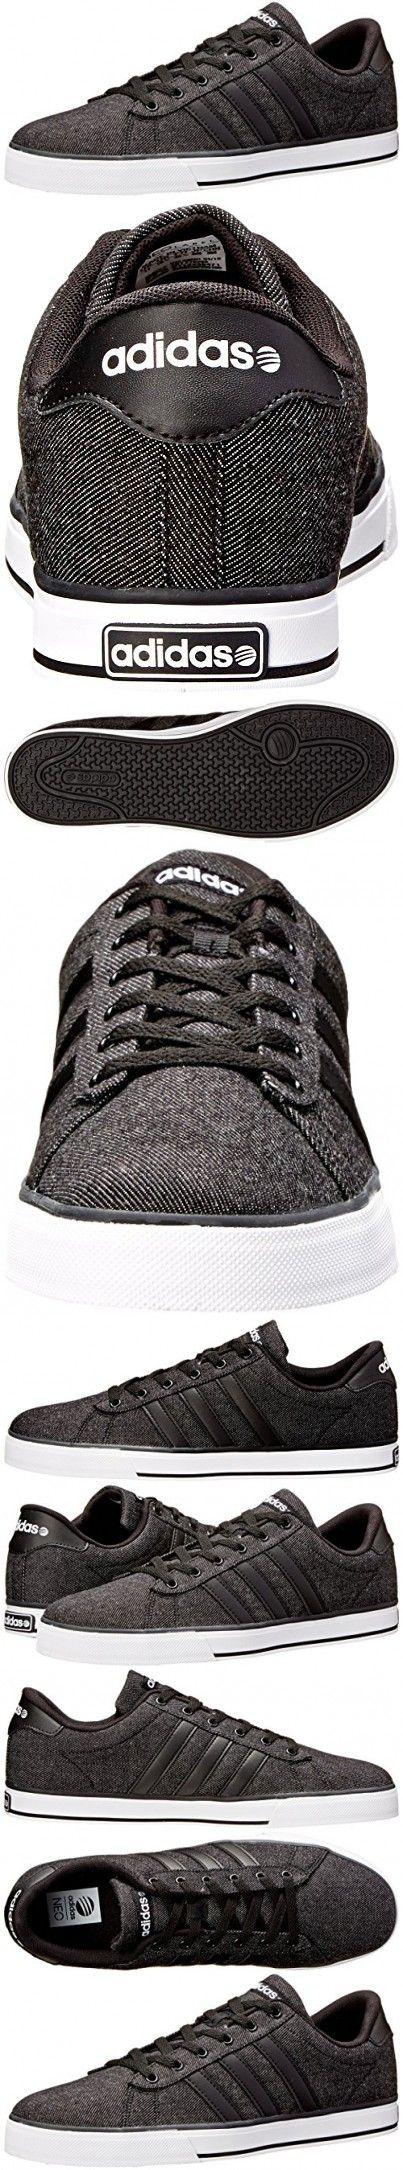 Adidas NEO Men's SE Daily Vulc Lifestyle Skateboarding Shoe,Black/Black/White,10.5 M US